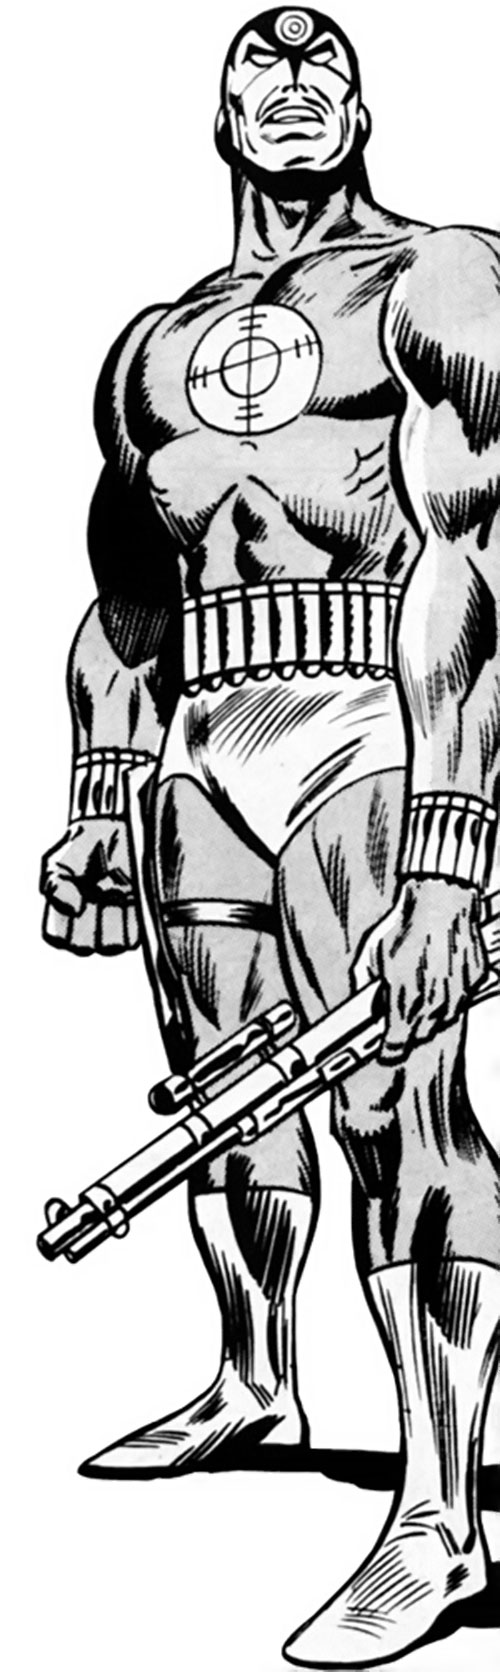 Slaymaster (Captain Britain enemy)